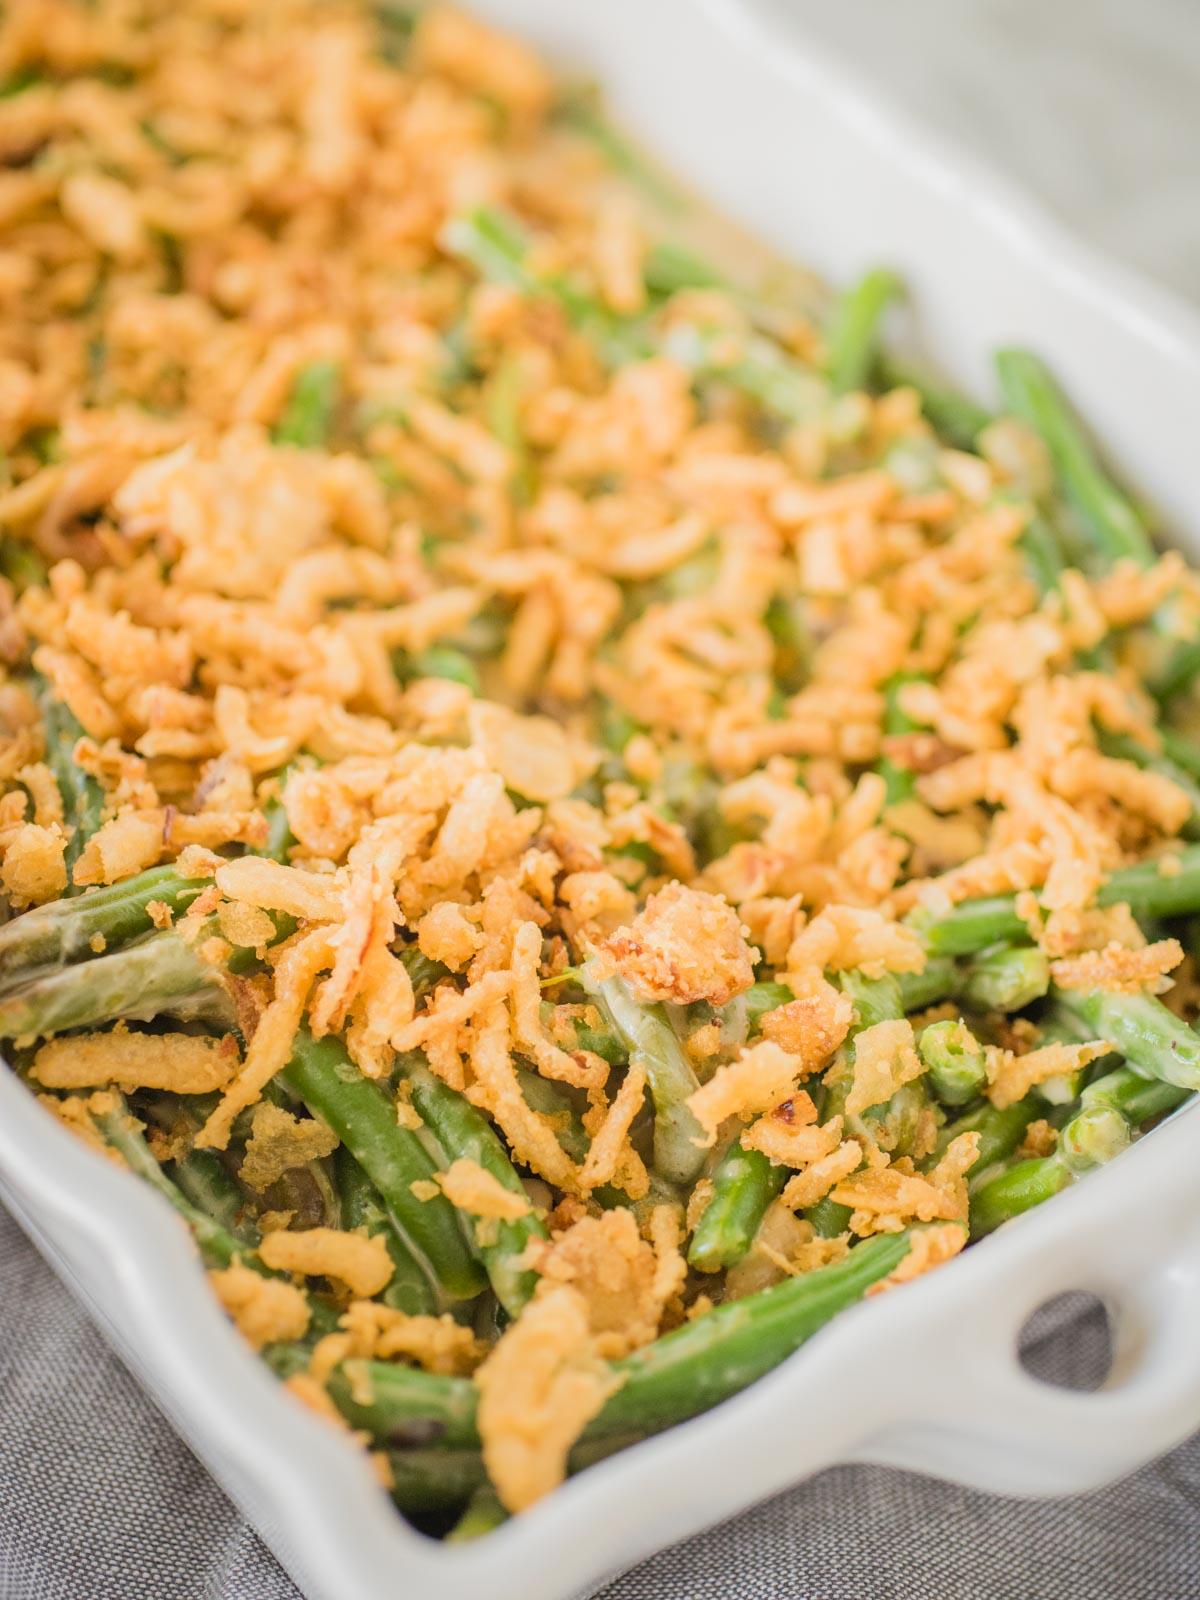 green bean casserole in a white serving dish